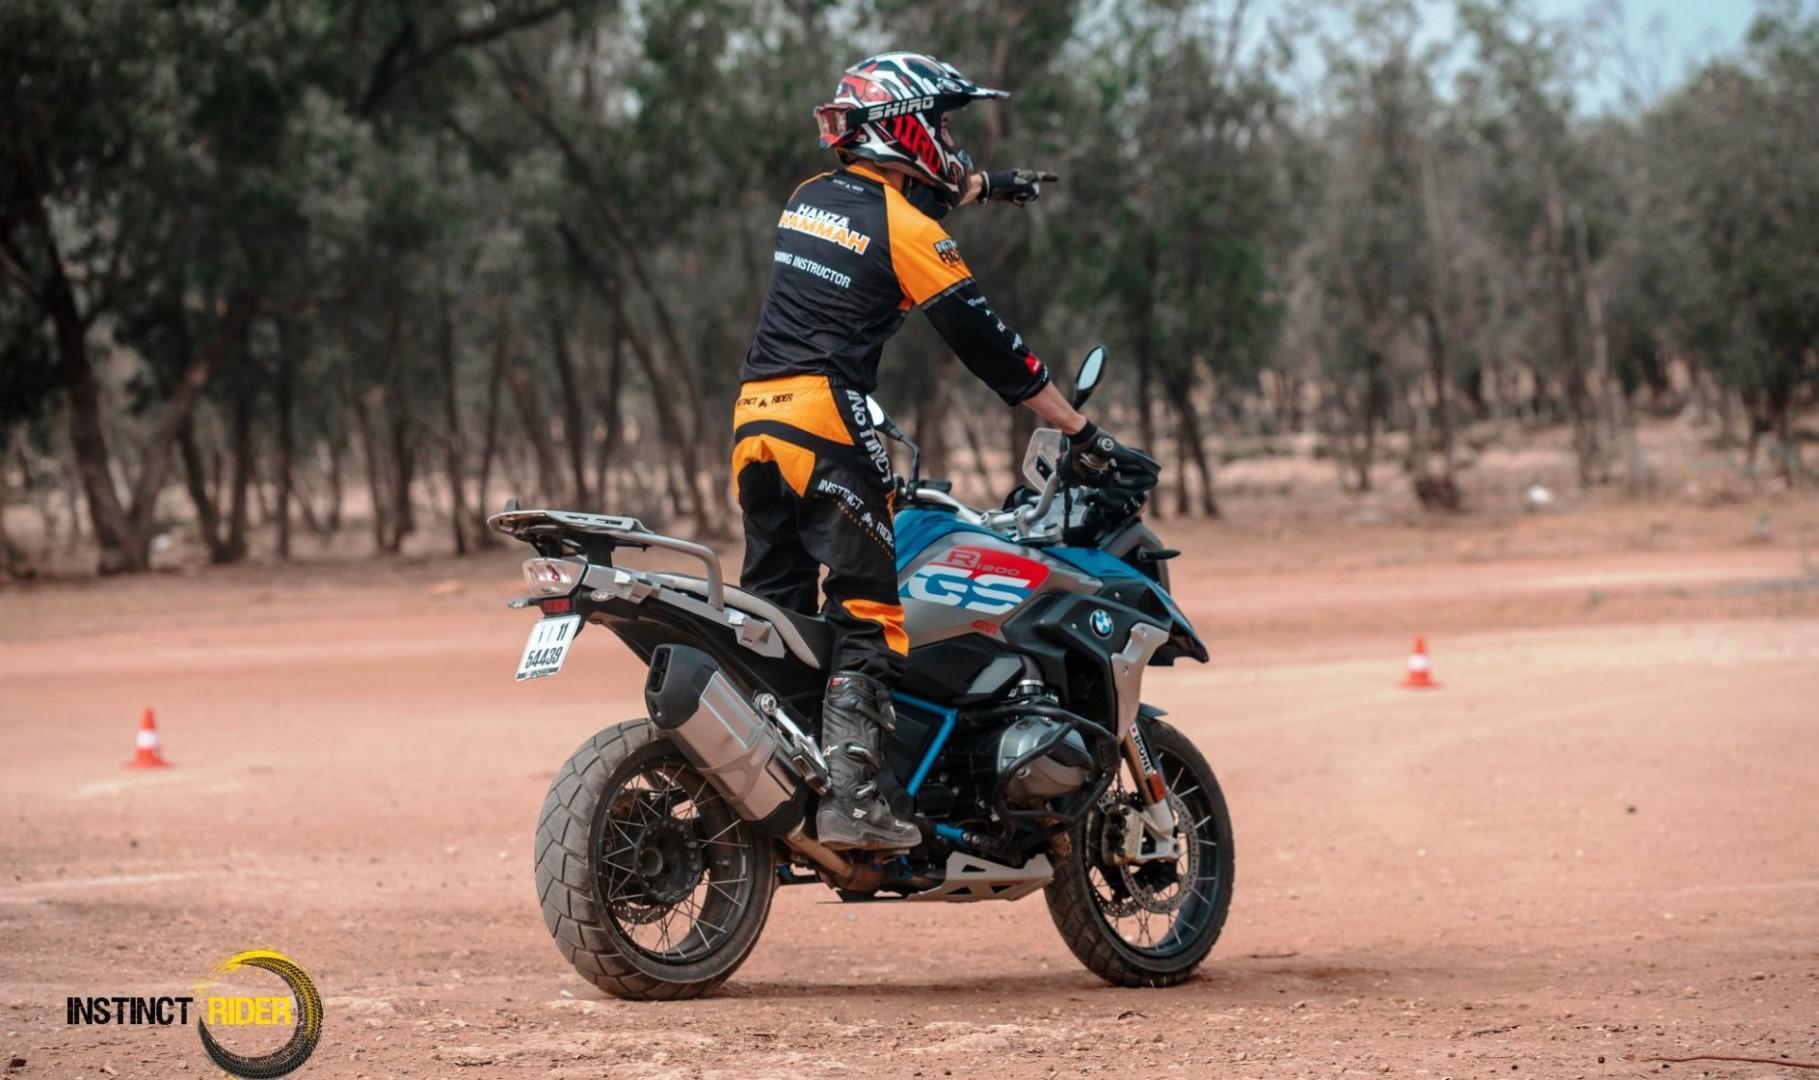 Interview exclusive avec Instinct Rider